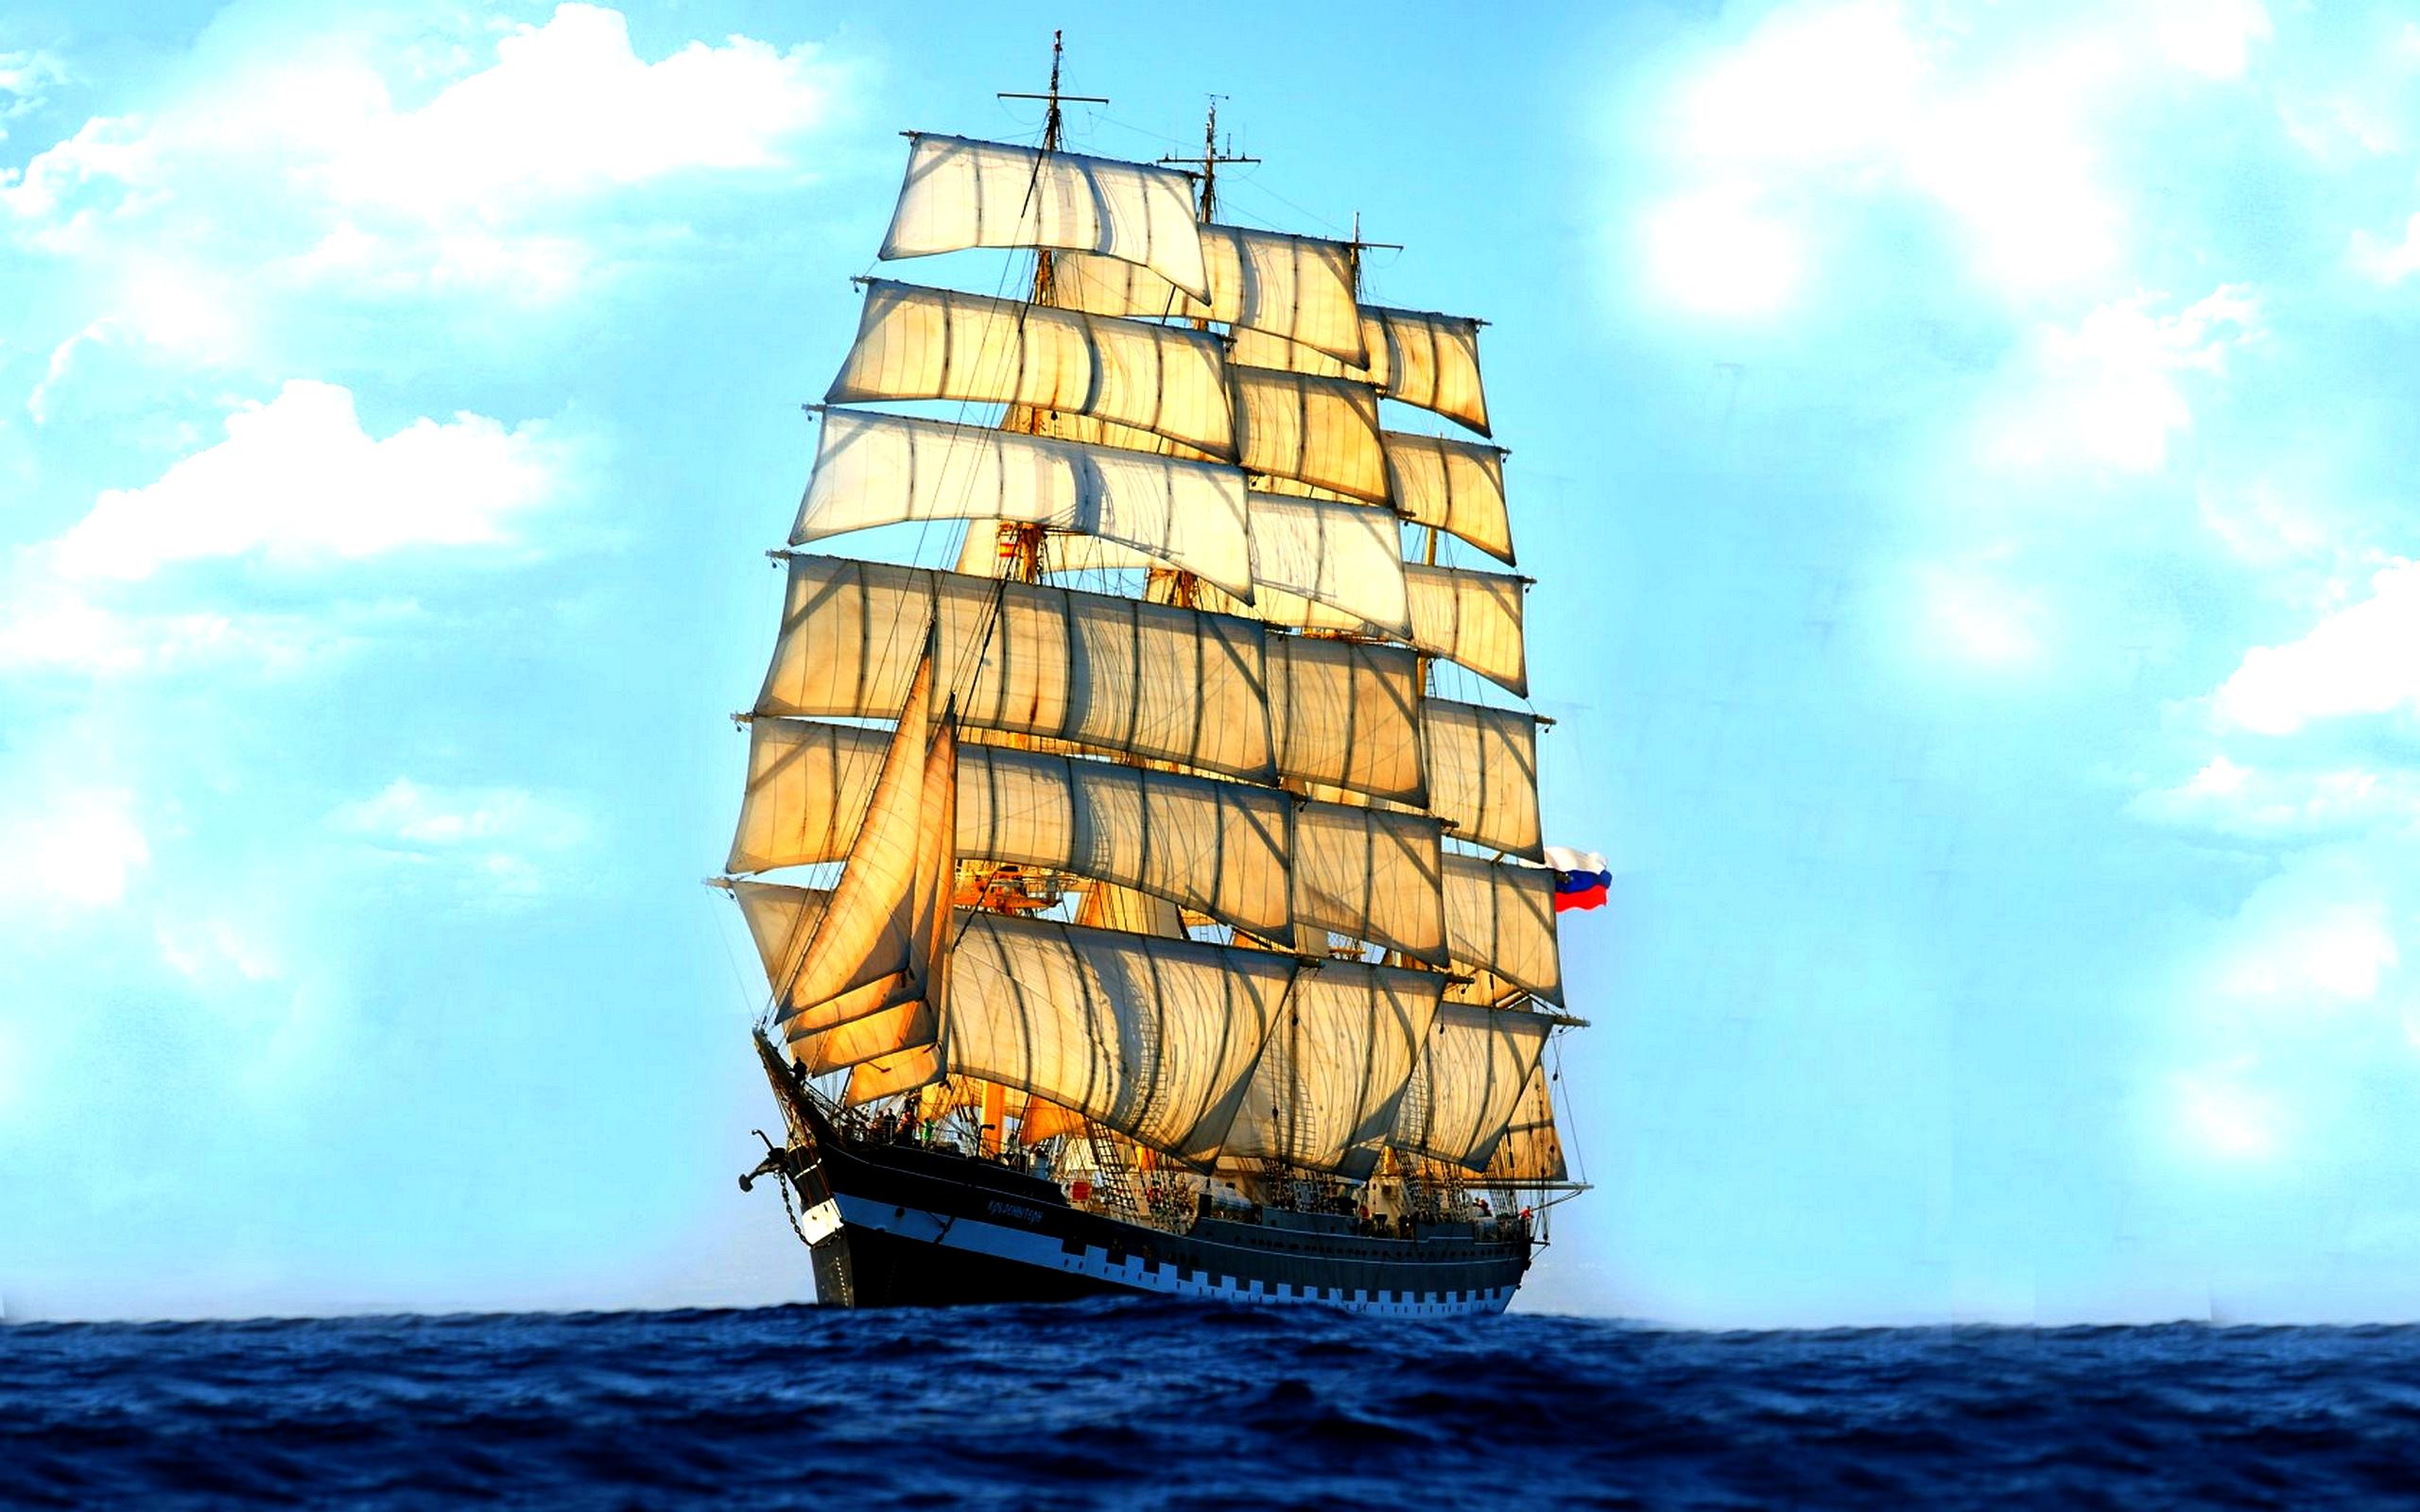 Sailing Ship HD wallpapers, Desktop wallpaper - most viewed